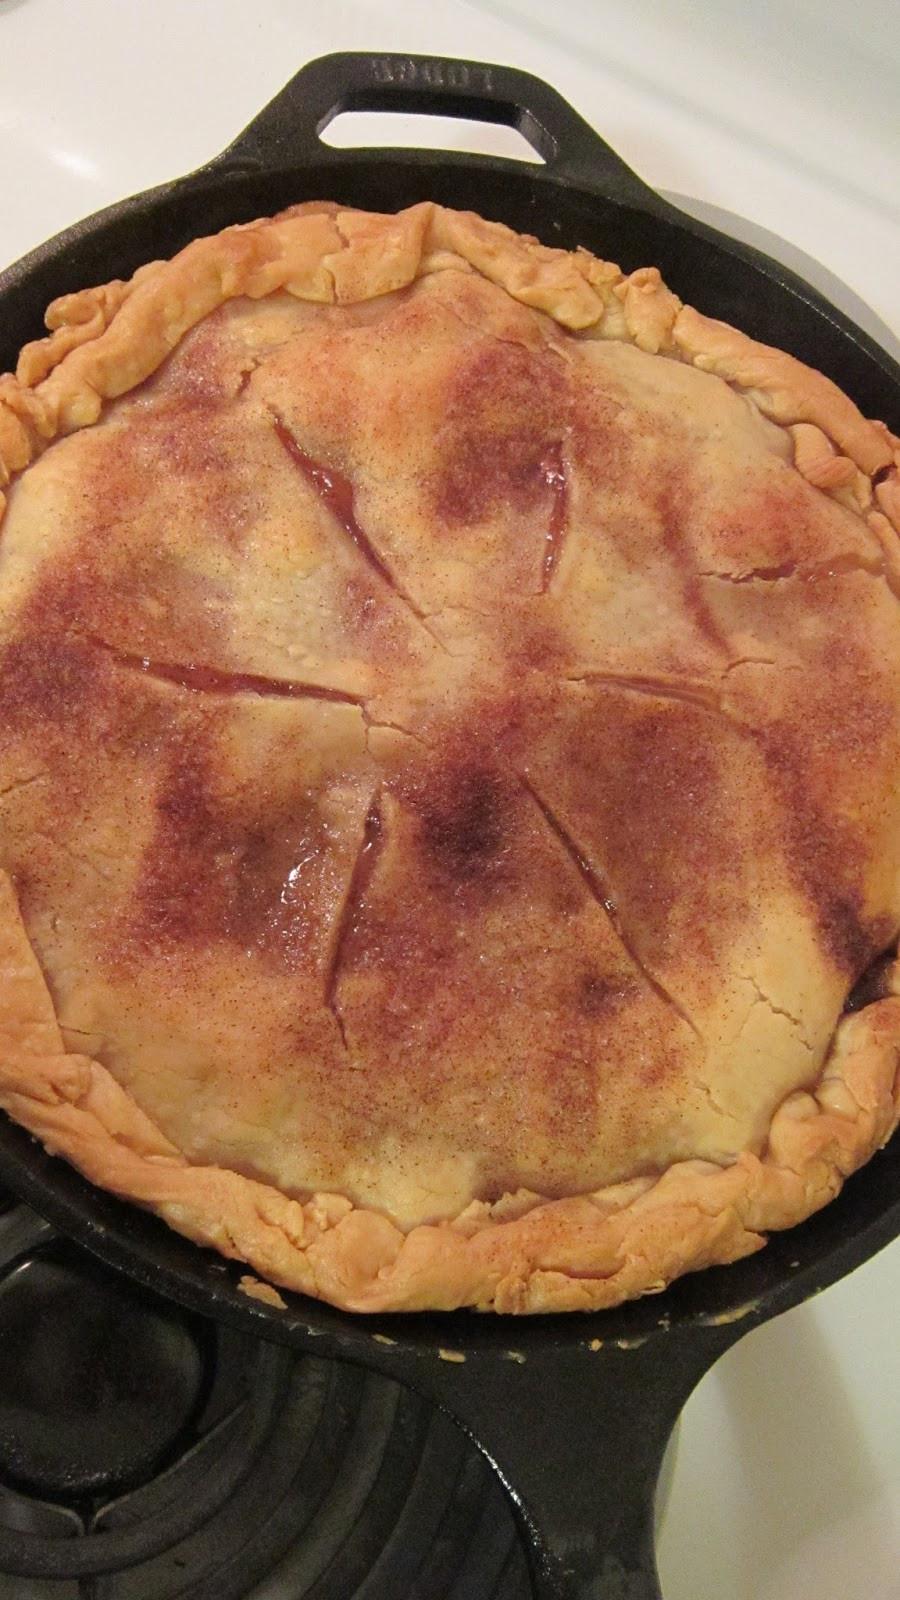 Trisha Yearwood Skillet Apple Pie  gold country girls Skillet Apple Pie From Trisha s